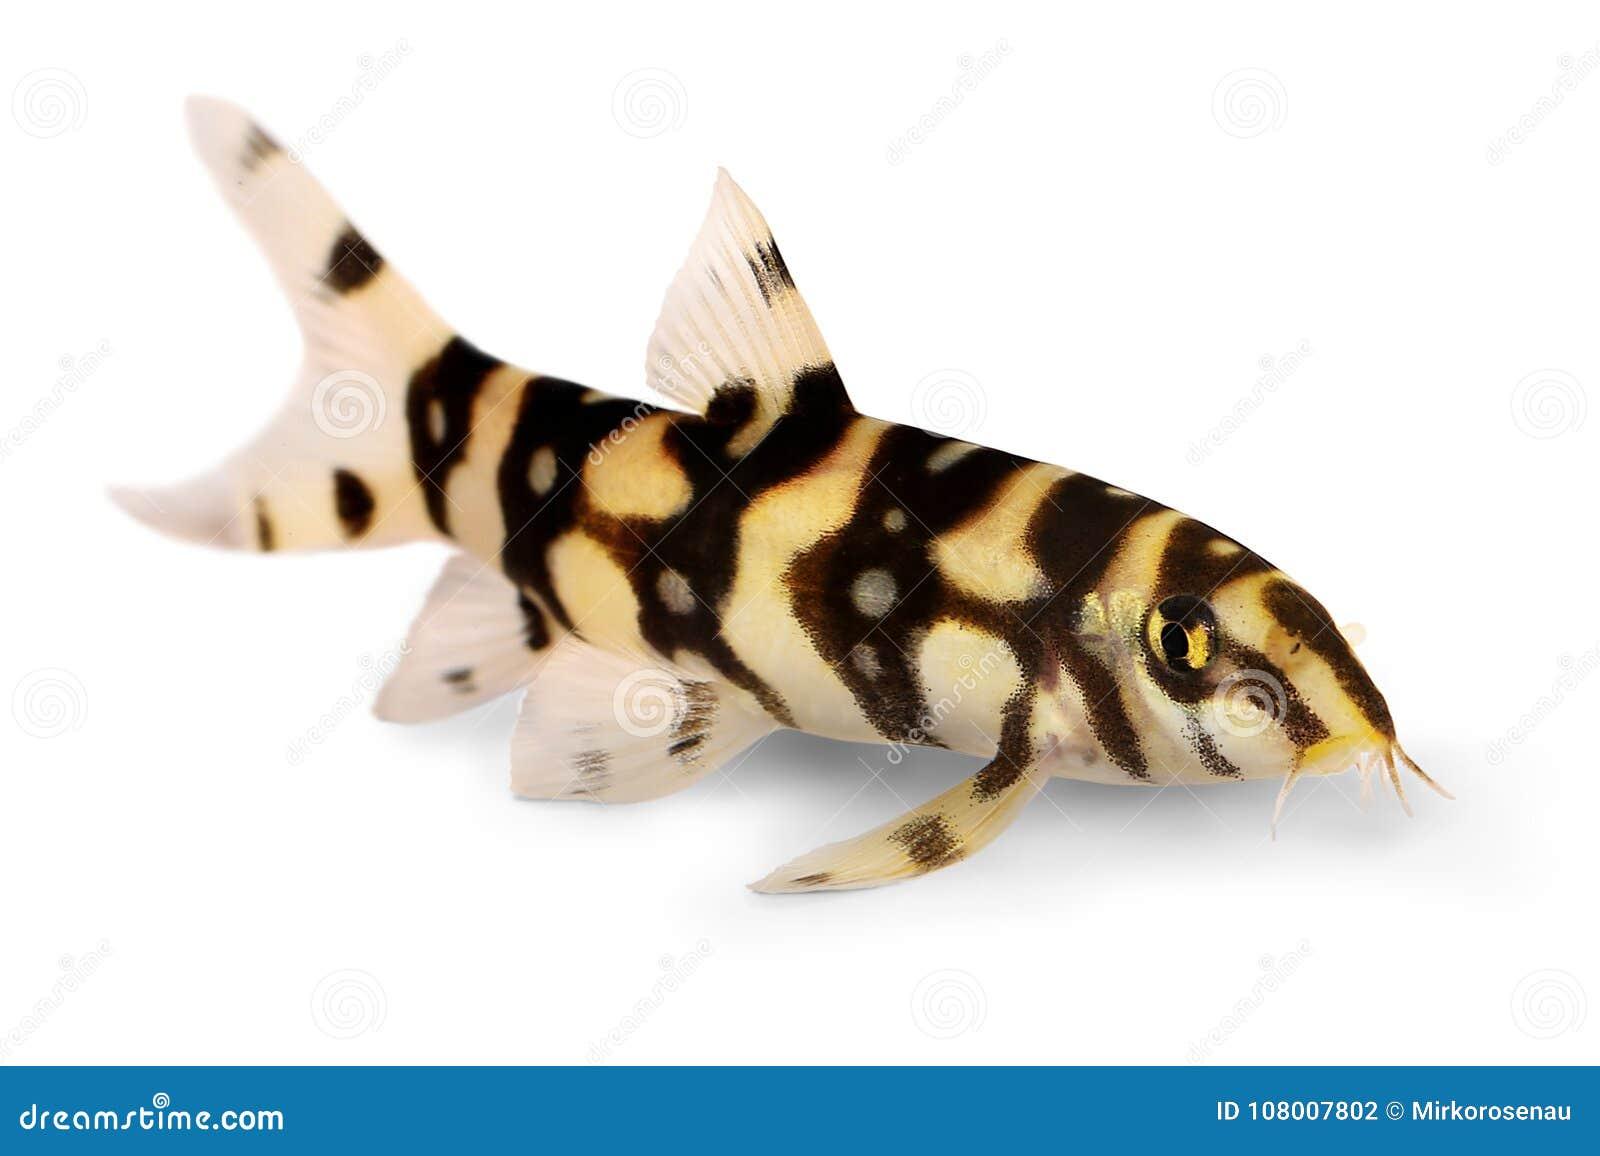 Burmese border loach catfish polka dot loach Botia kubotai aquarium fish